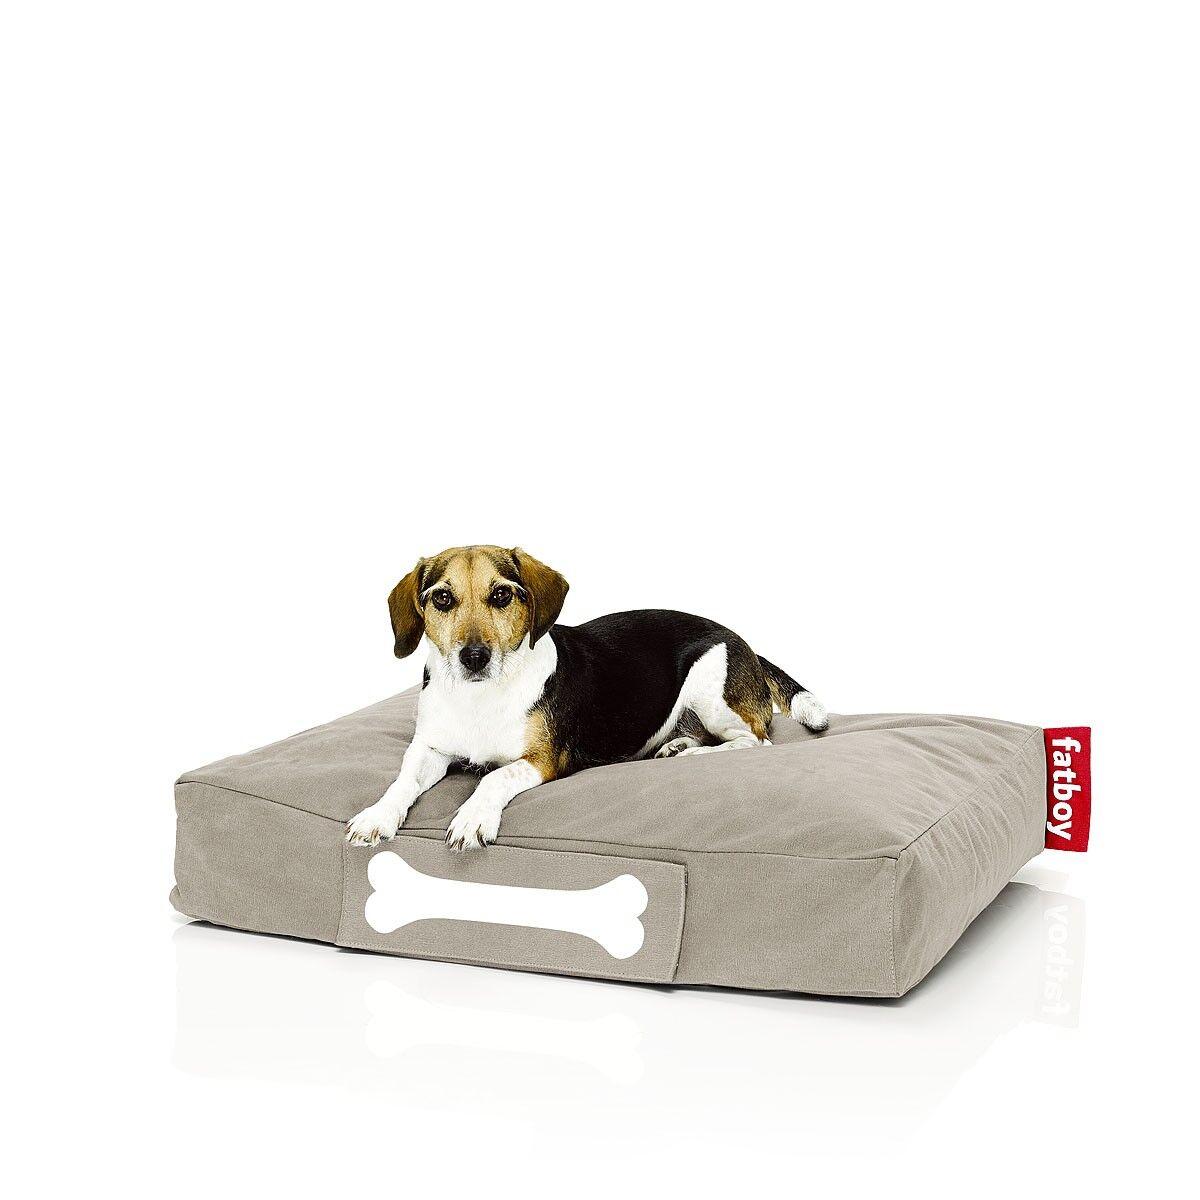 FATBOY sac pouf pour chiens et chats DOGGIELOUNGE STONEWASHED SMALL (Sable - 100% Coton)